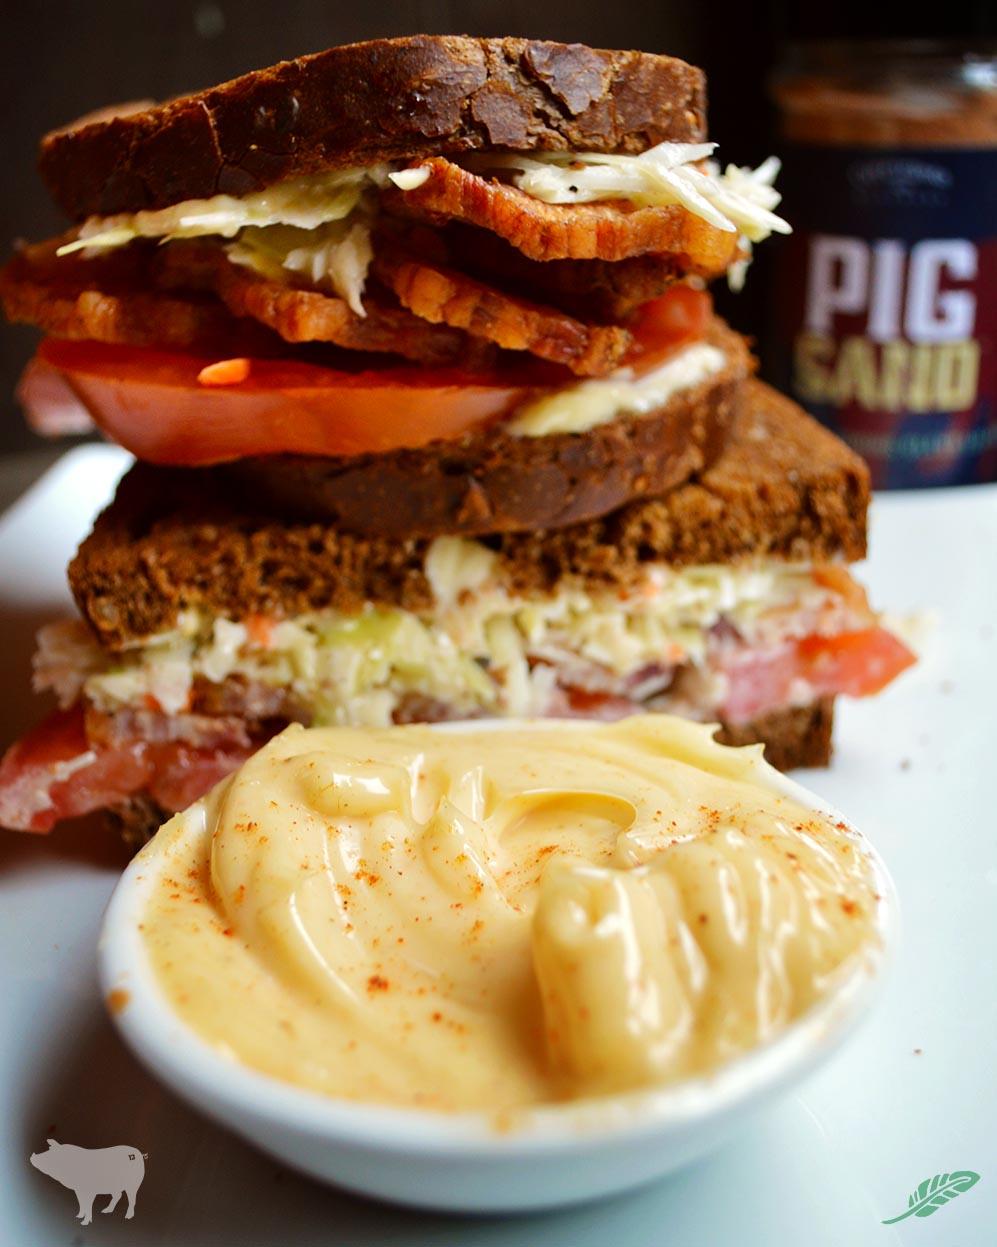 pig_sand-170110-bct-sandwich-container-6-1247.jpg